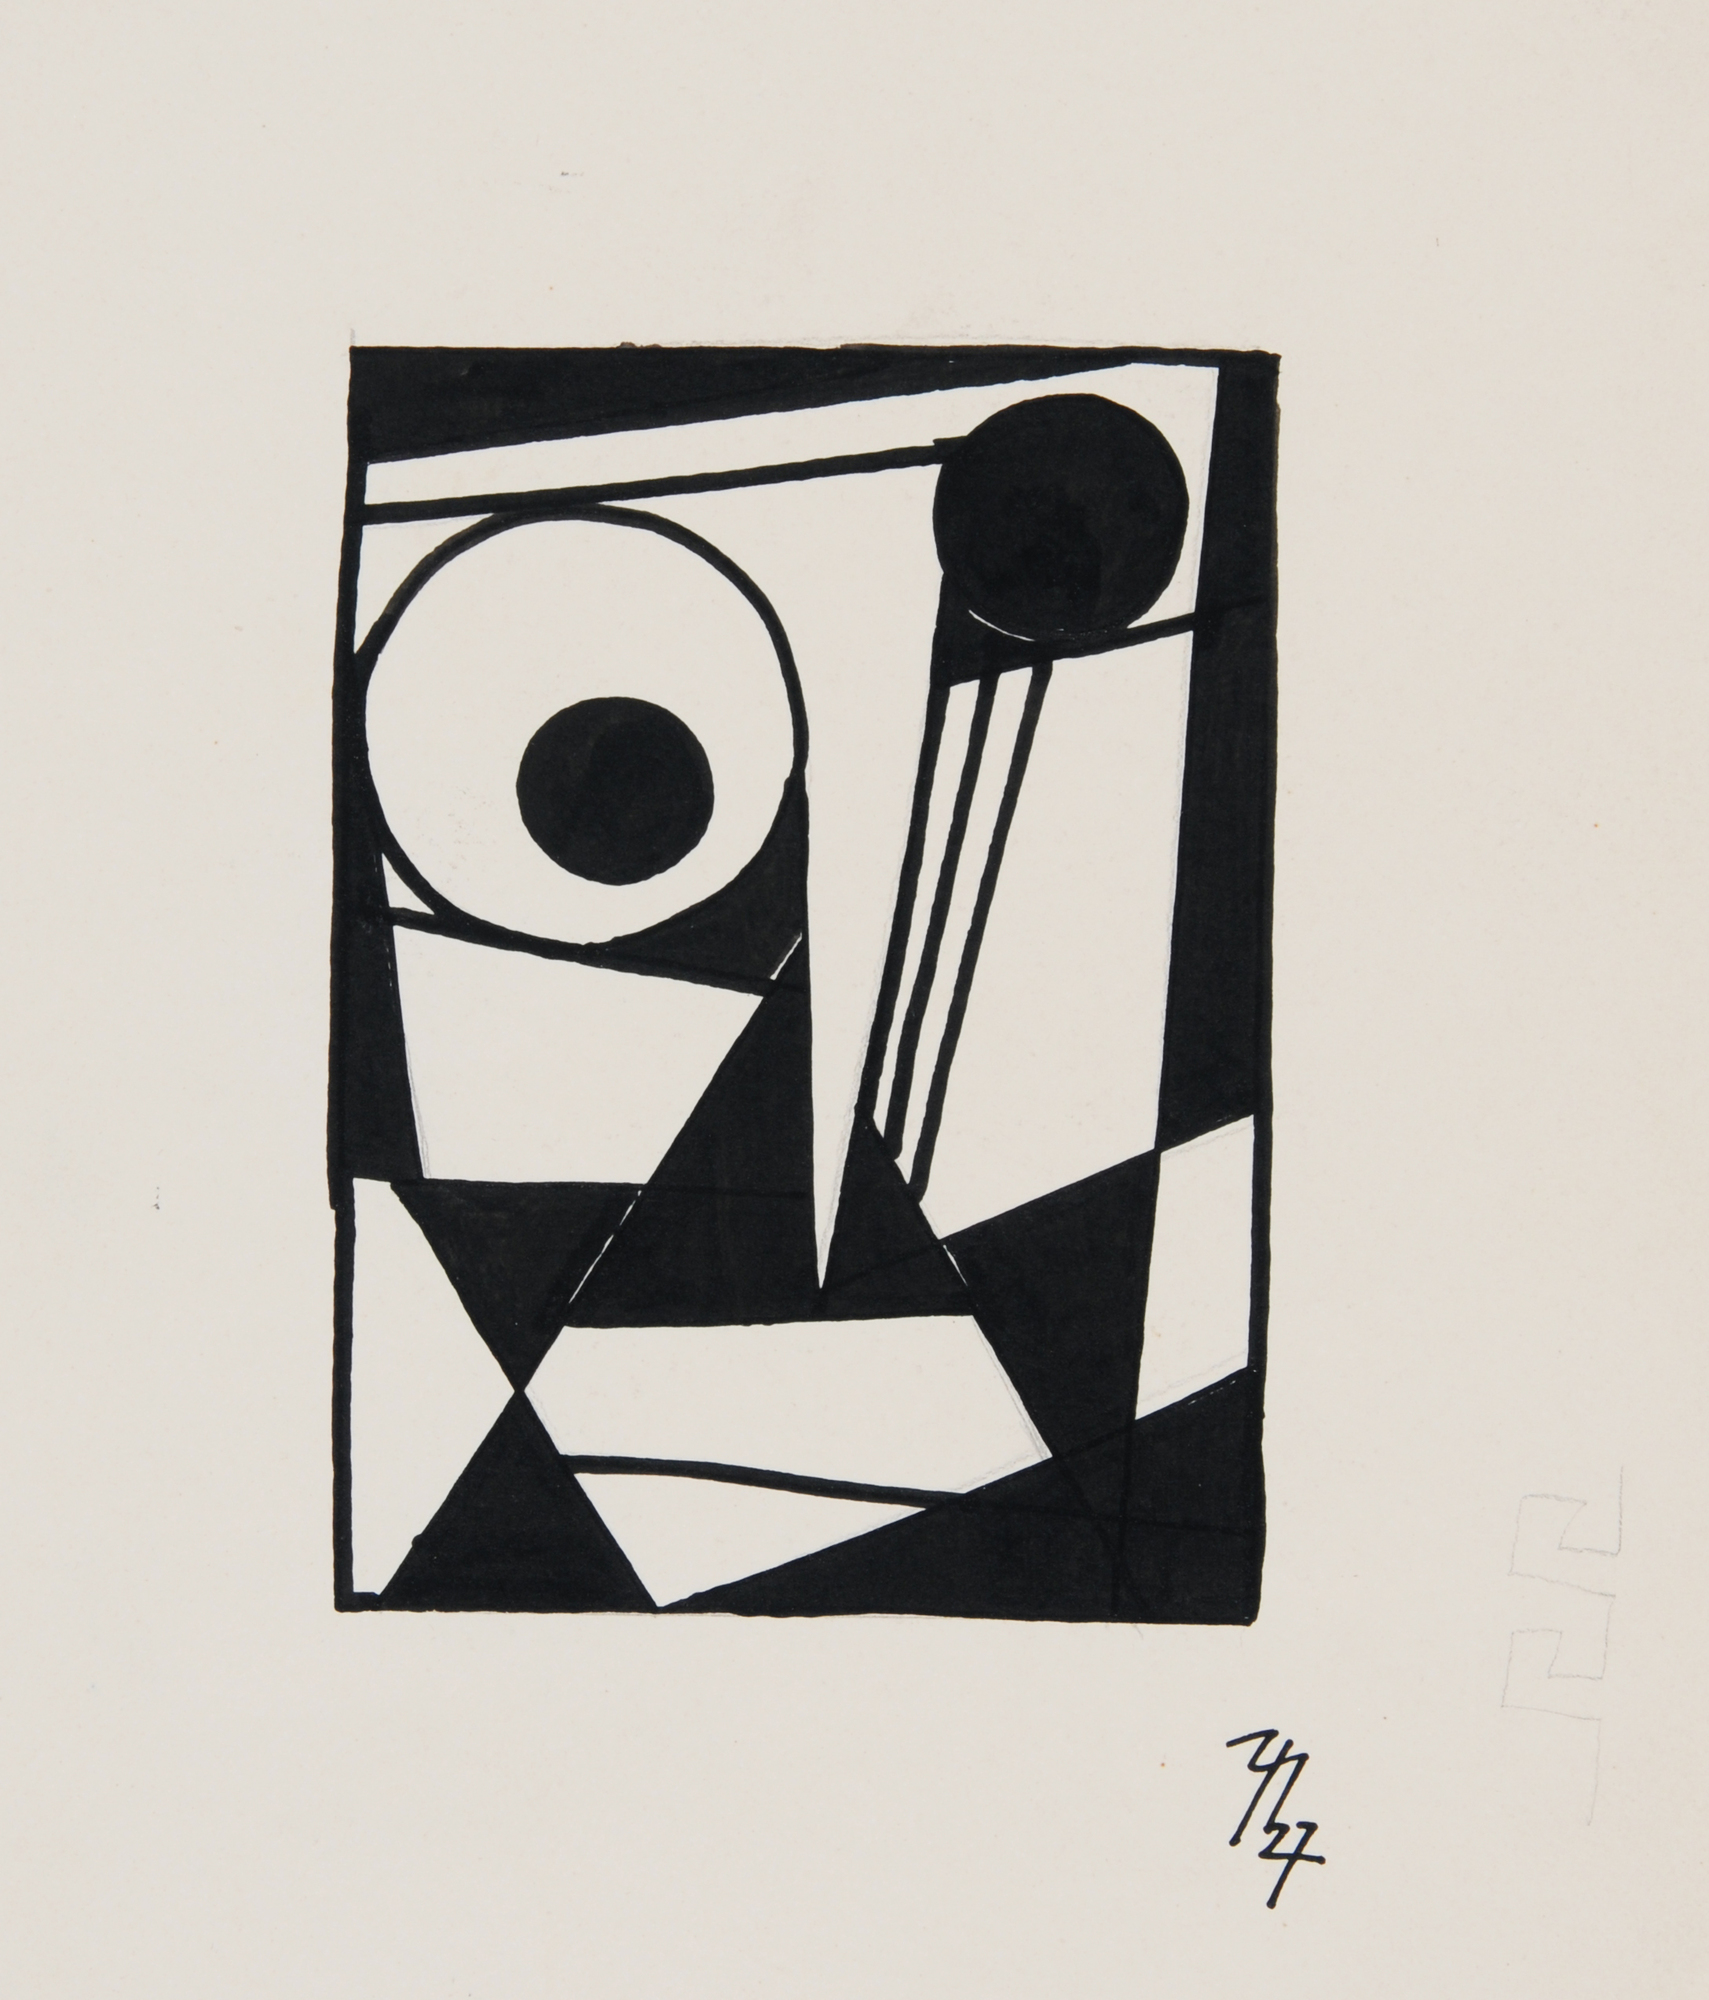 Maatsch Thilo, Composition